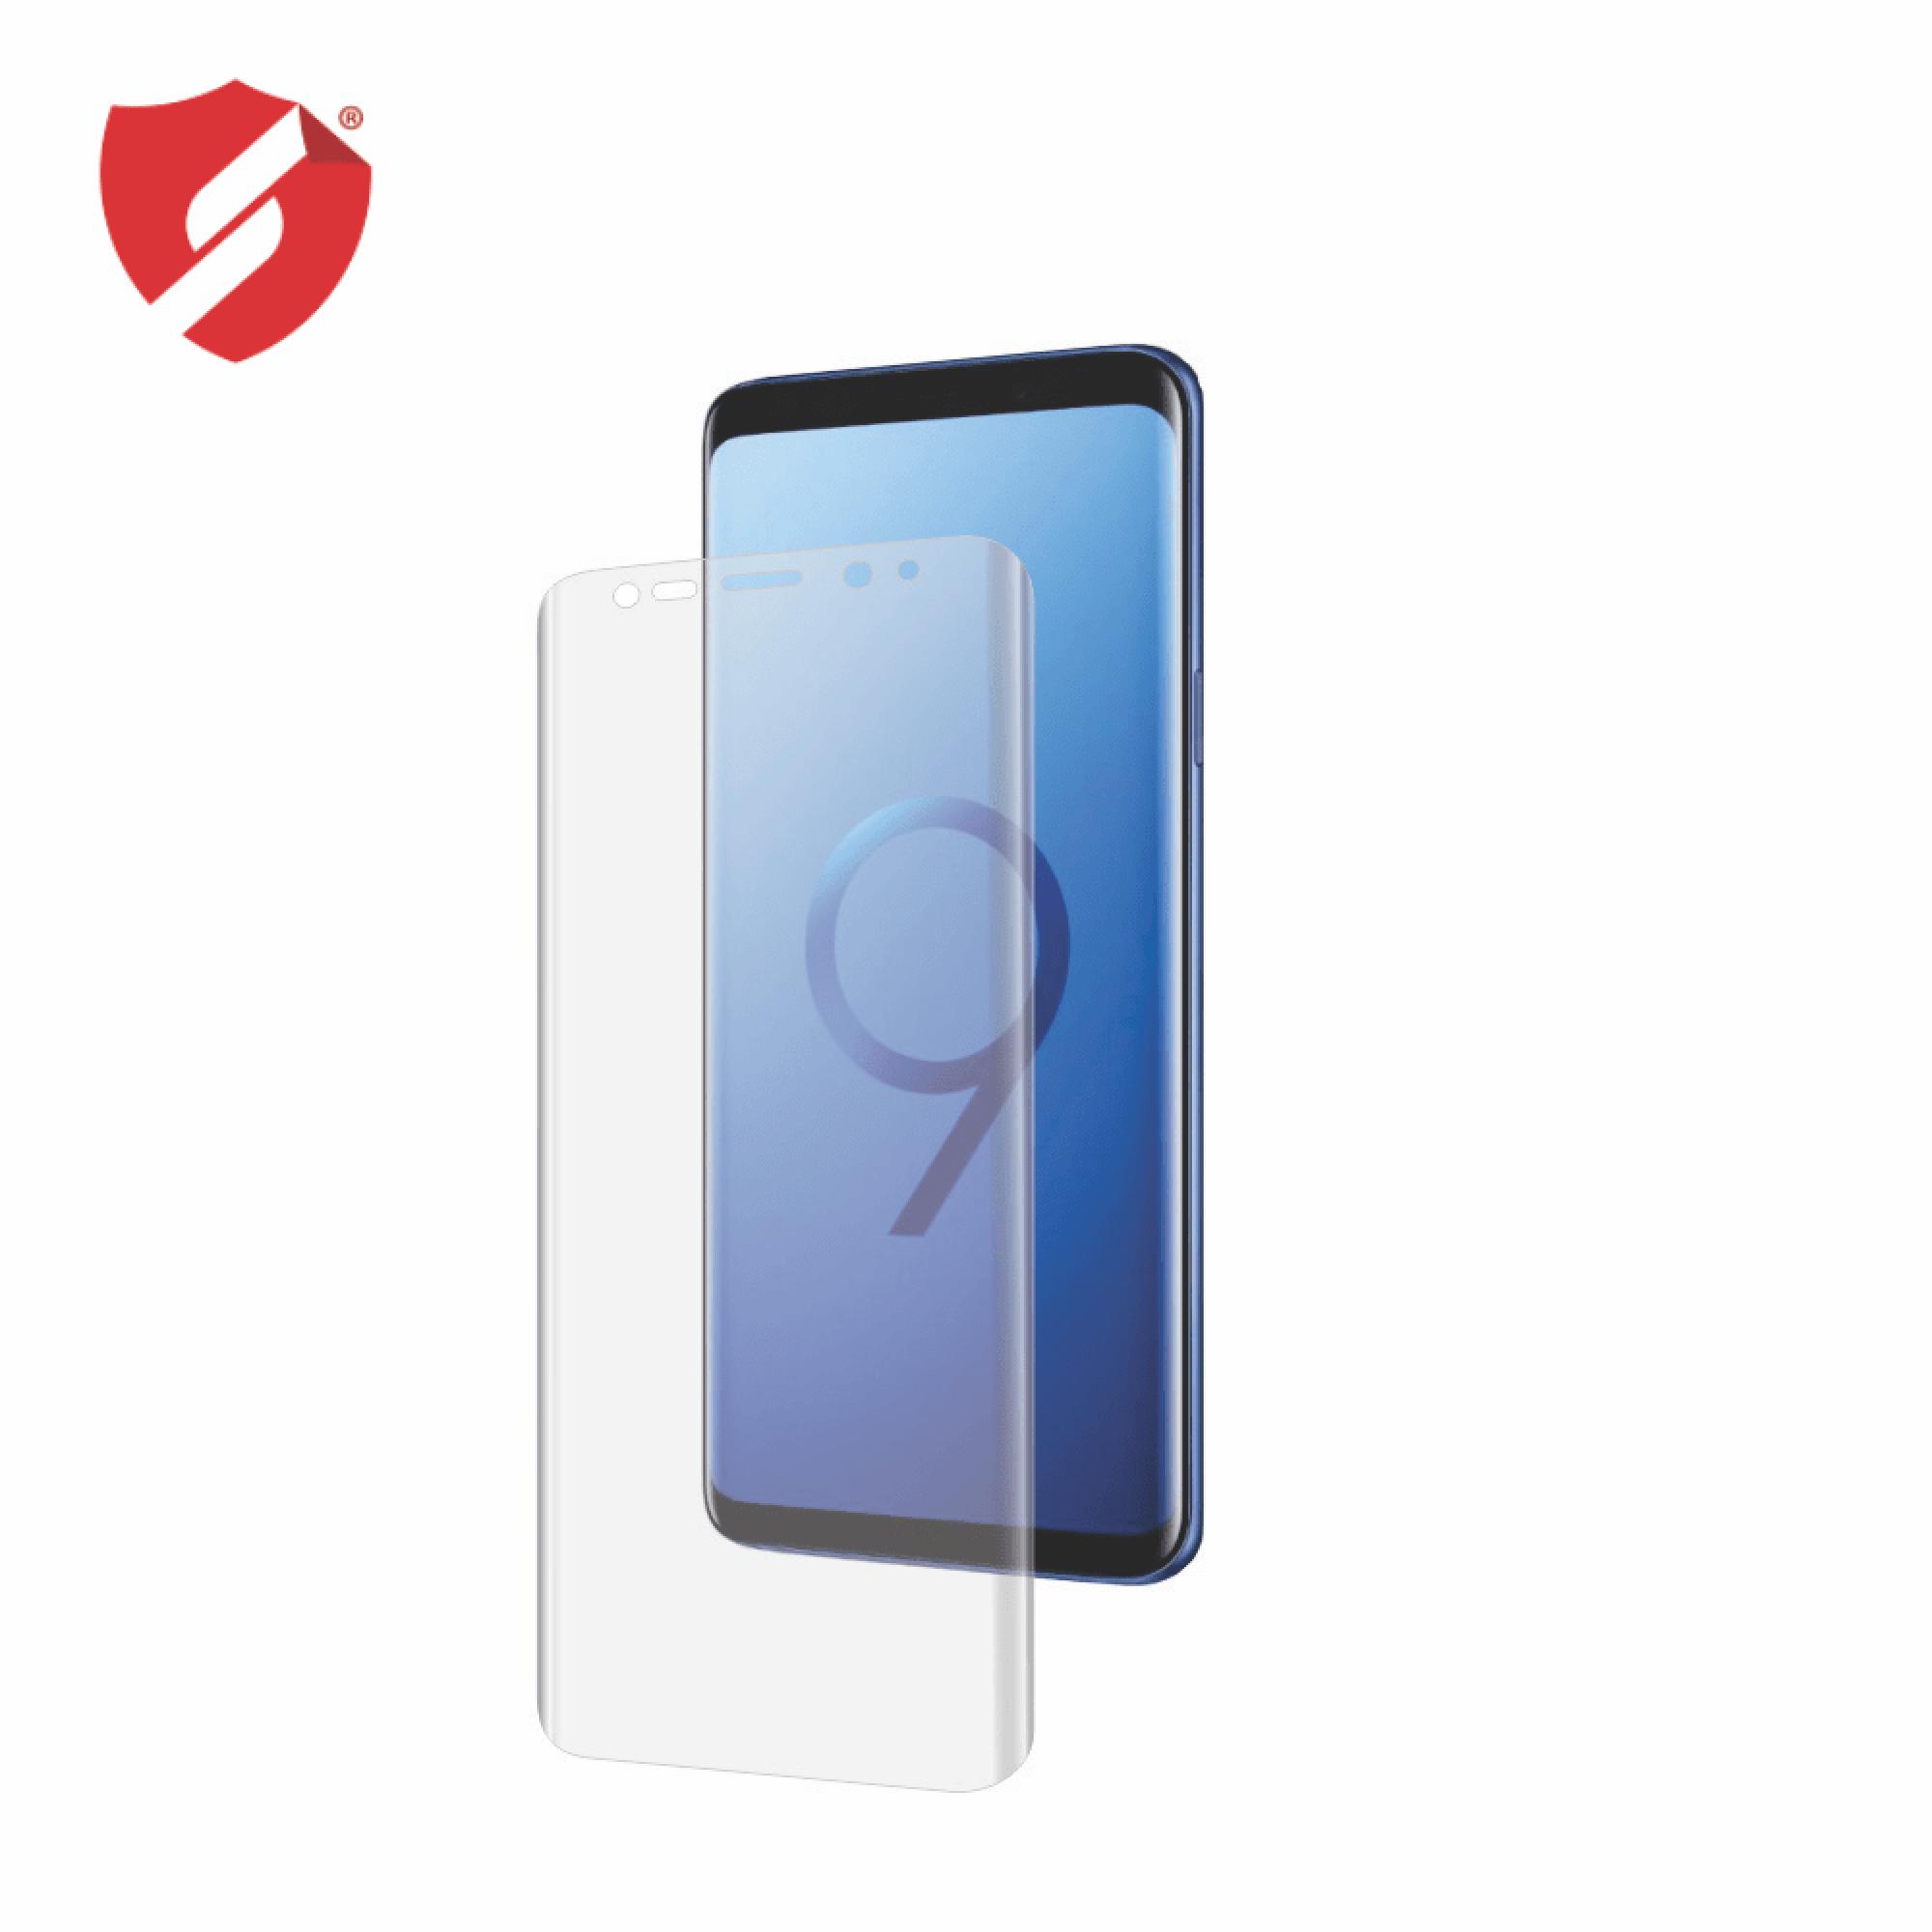 Folie de protectie Smart Protection Samsung Galaxy S9 compatibila cu carcasa Spigen Thin Fit - doar-display imagine